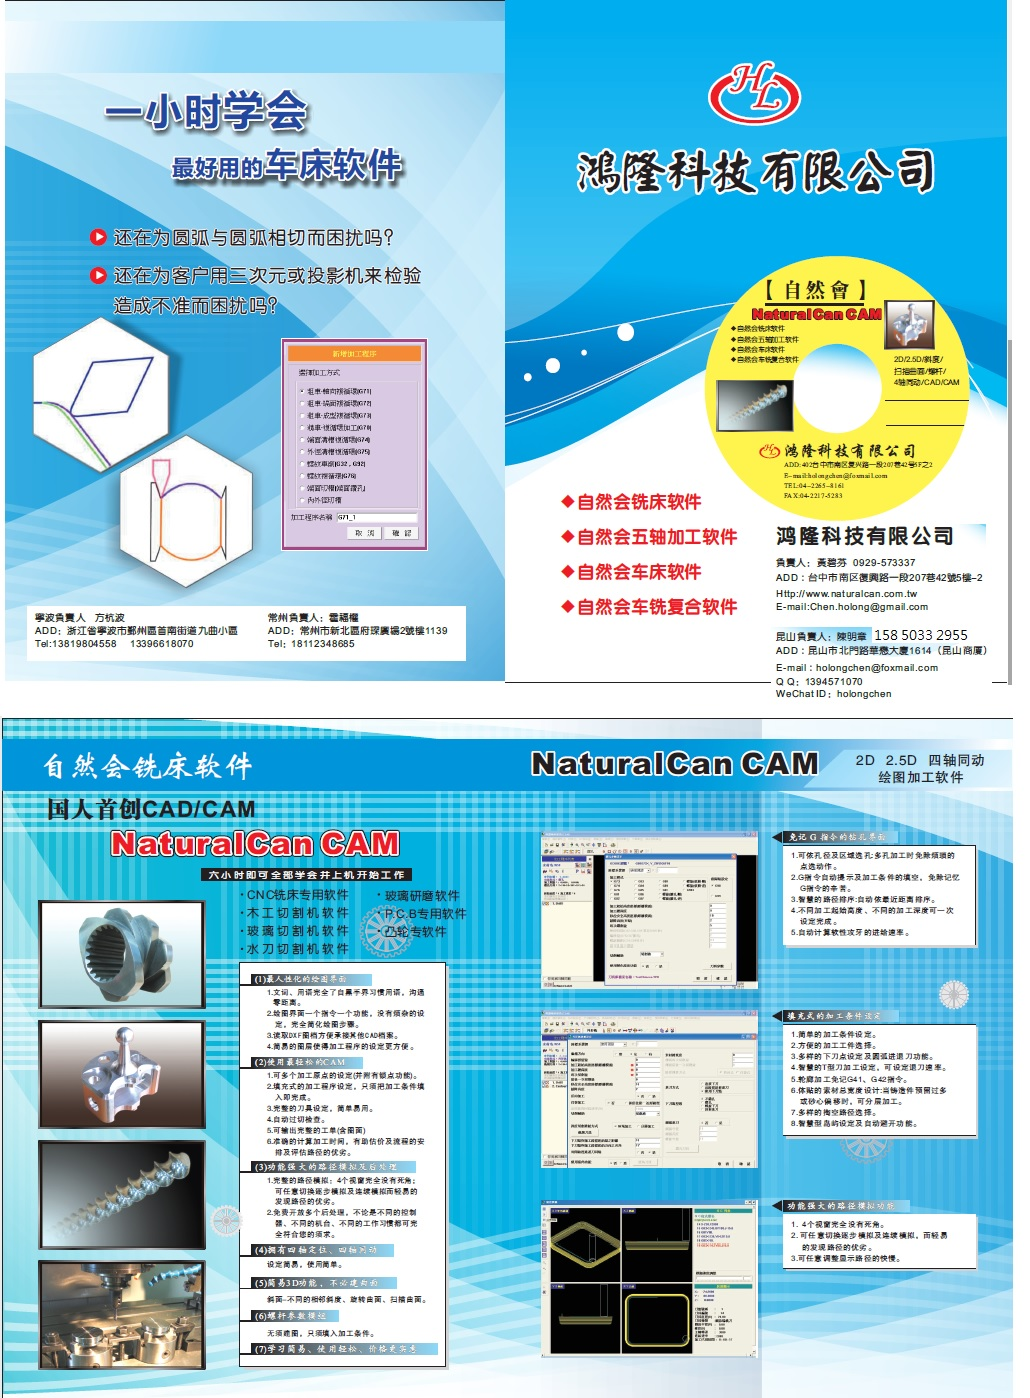 honglong technology co., LTD.